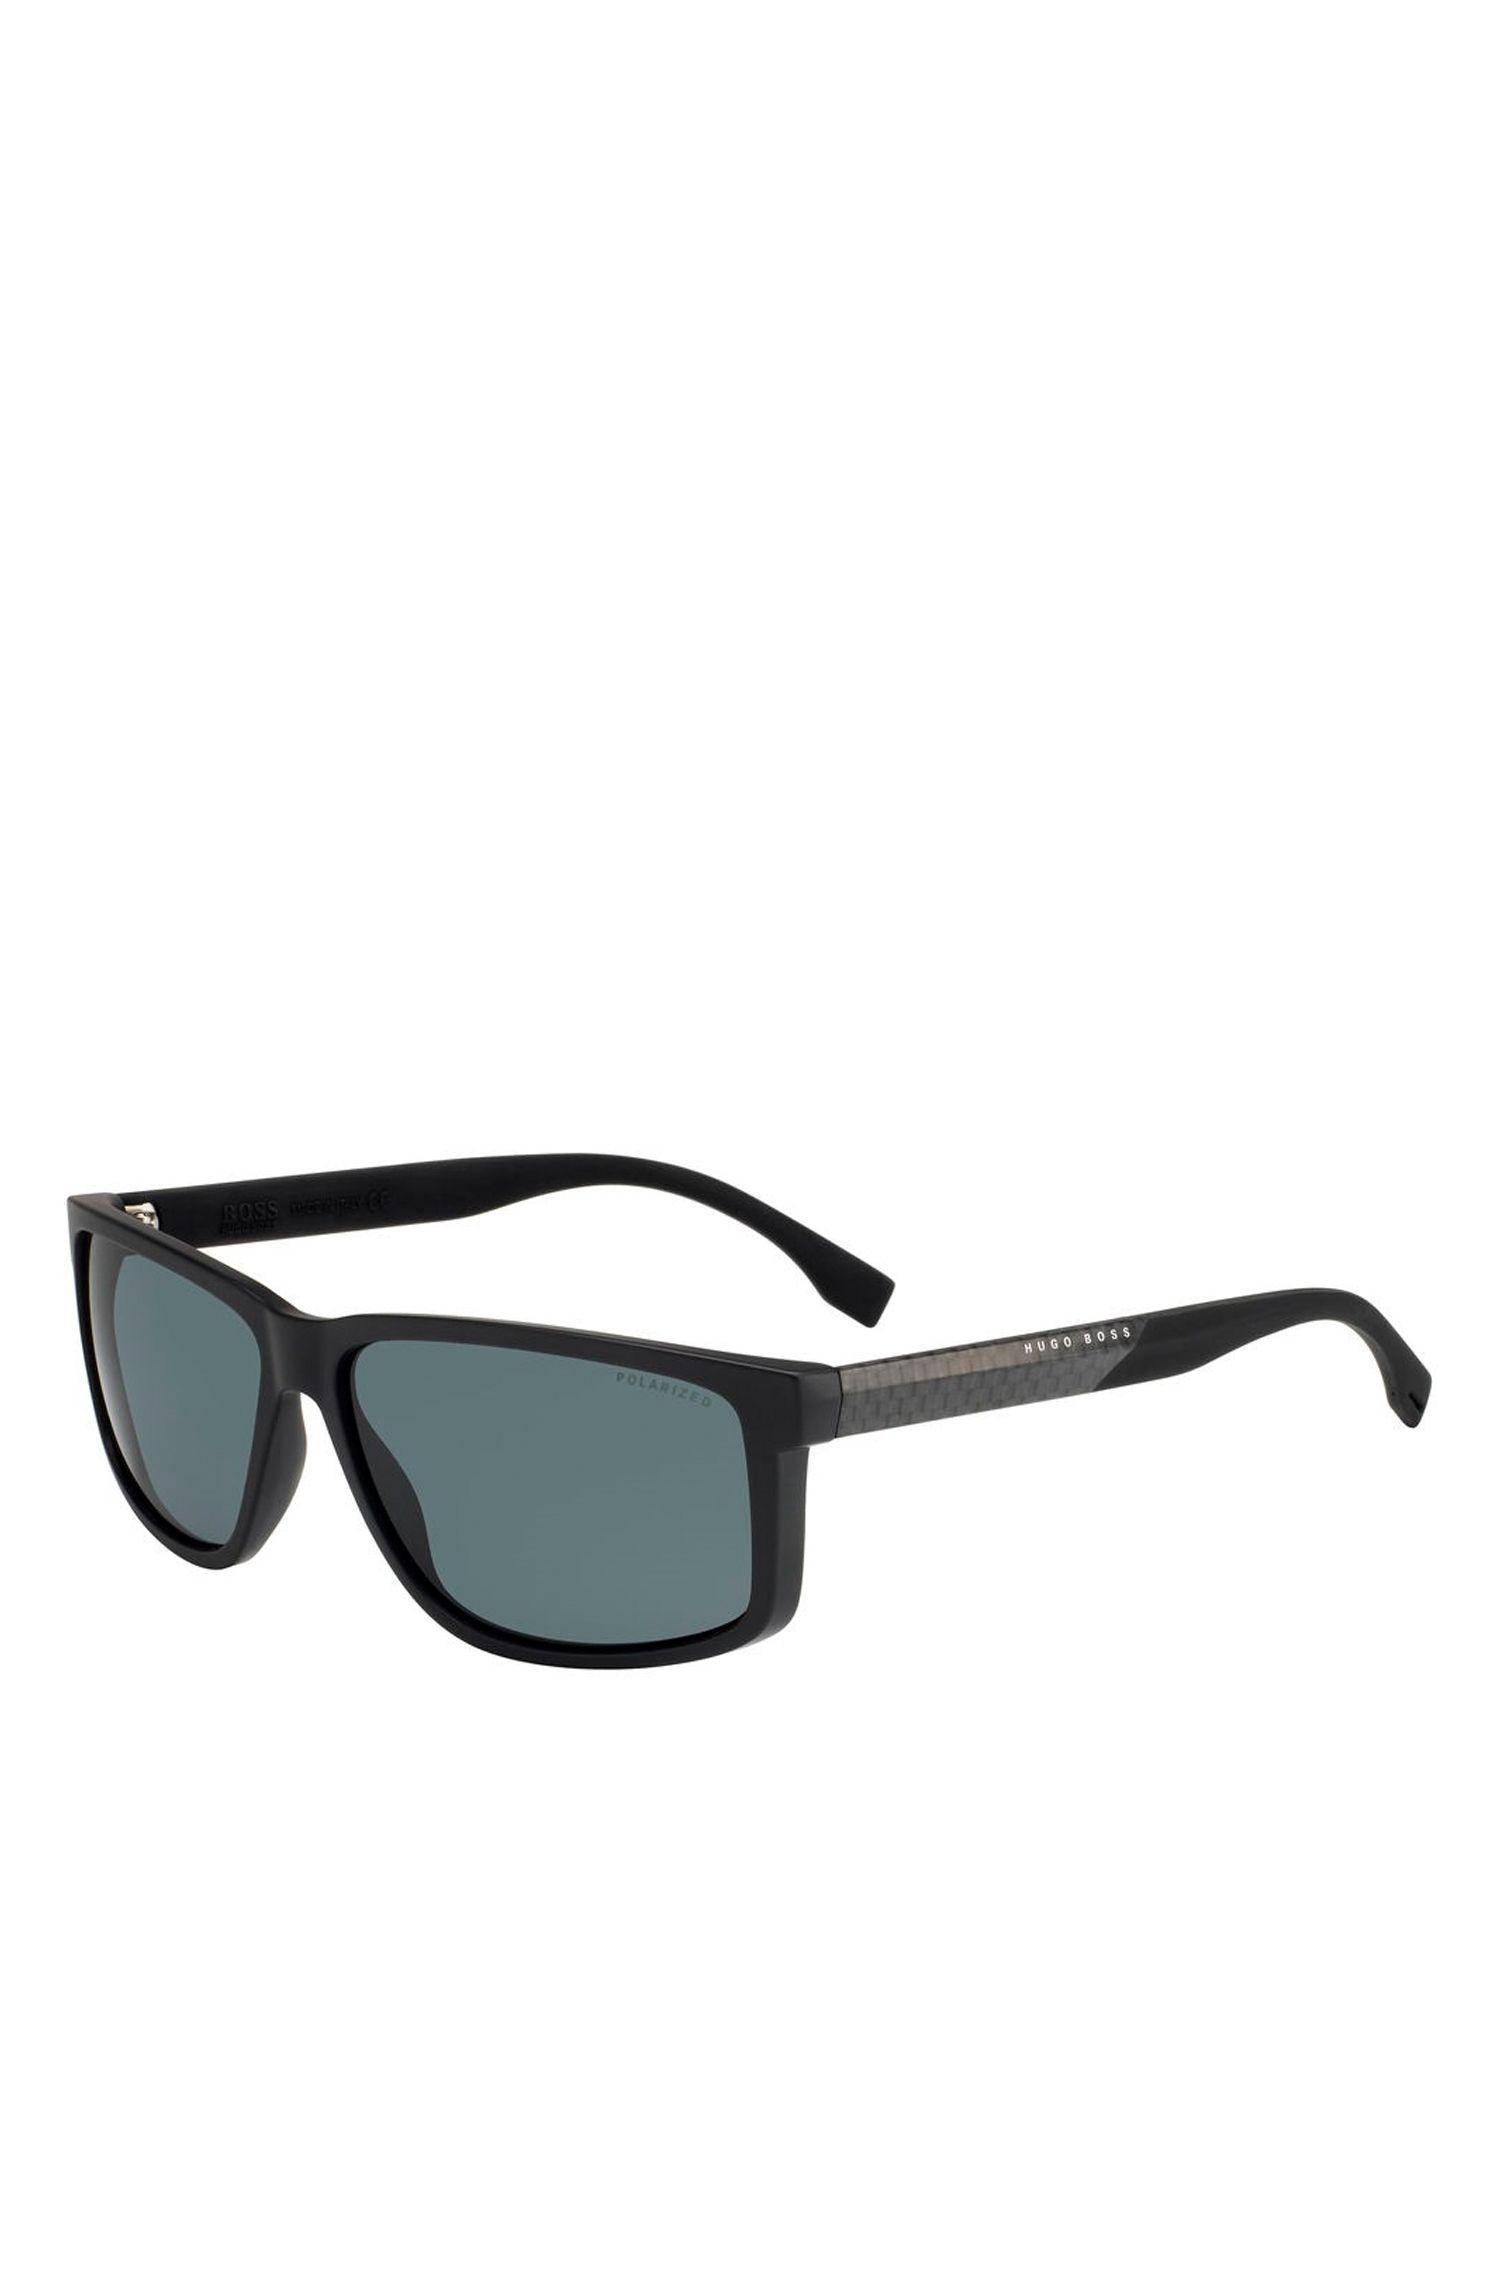 'BOSS 0833S' | Rectangular Carbon Fiber Polarized Sunglasses